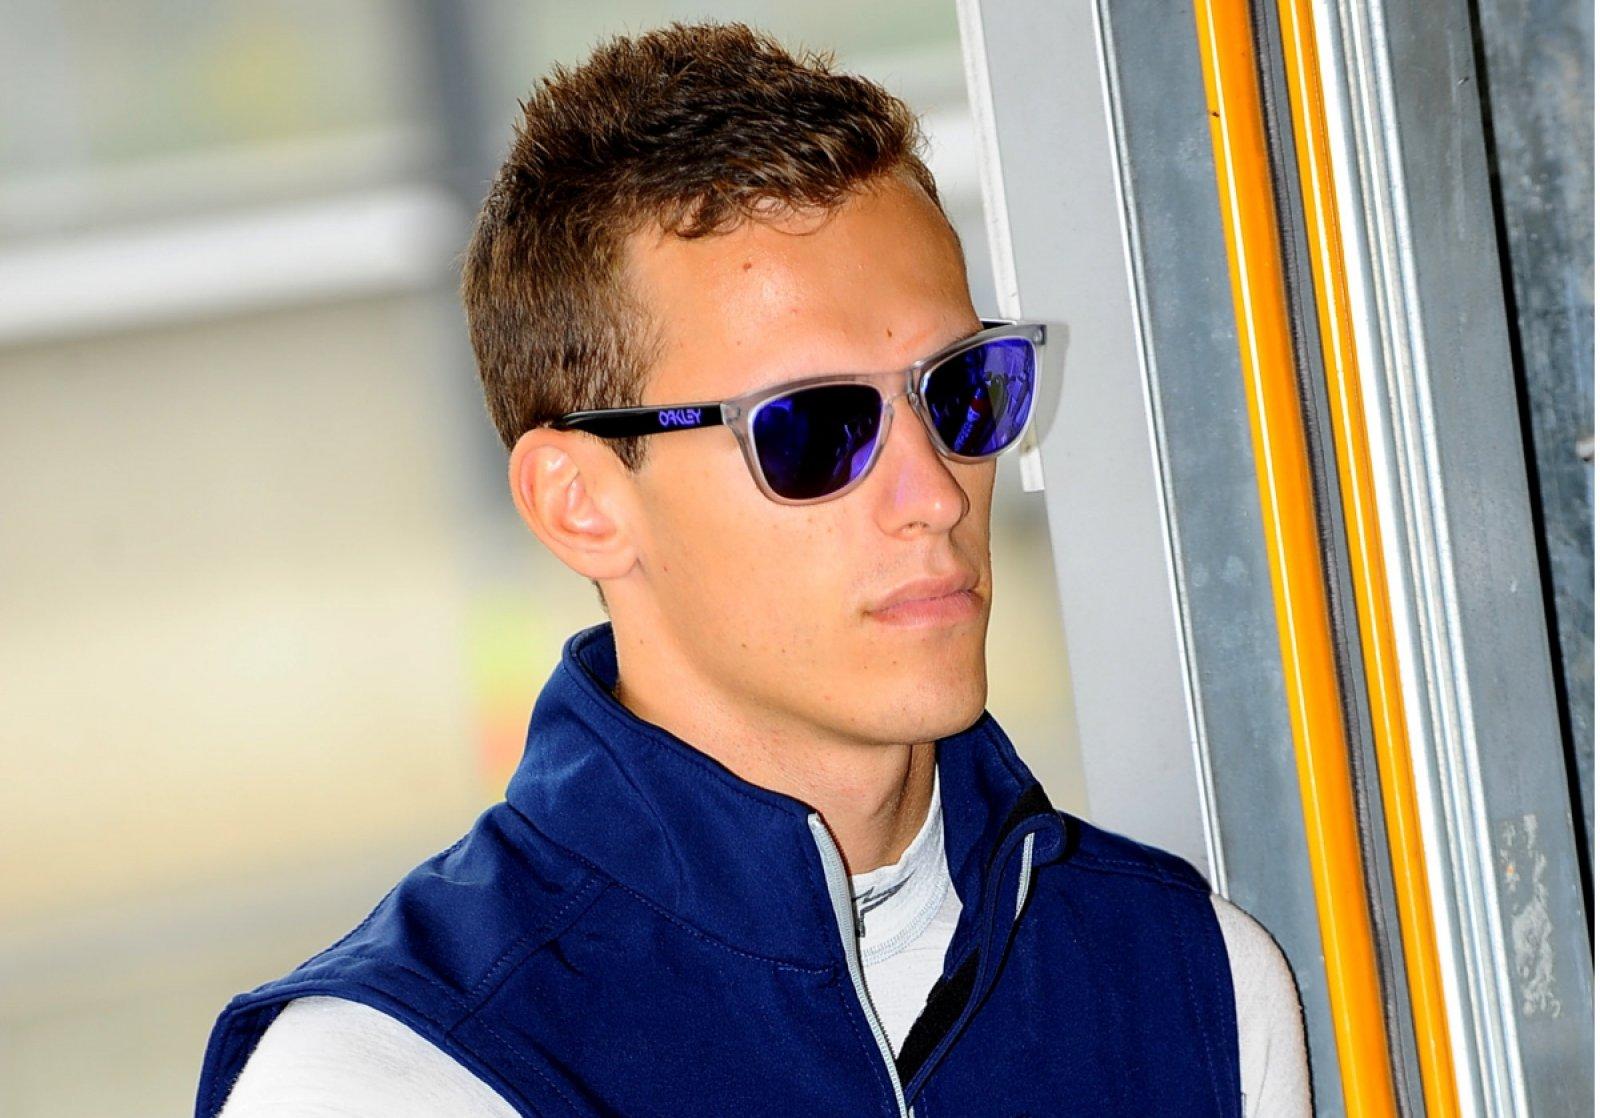 Sean Walkinshaw aiming for 2015 Total 24 Hours of Spa & Blancpain Sprint Series